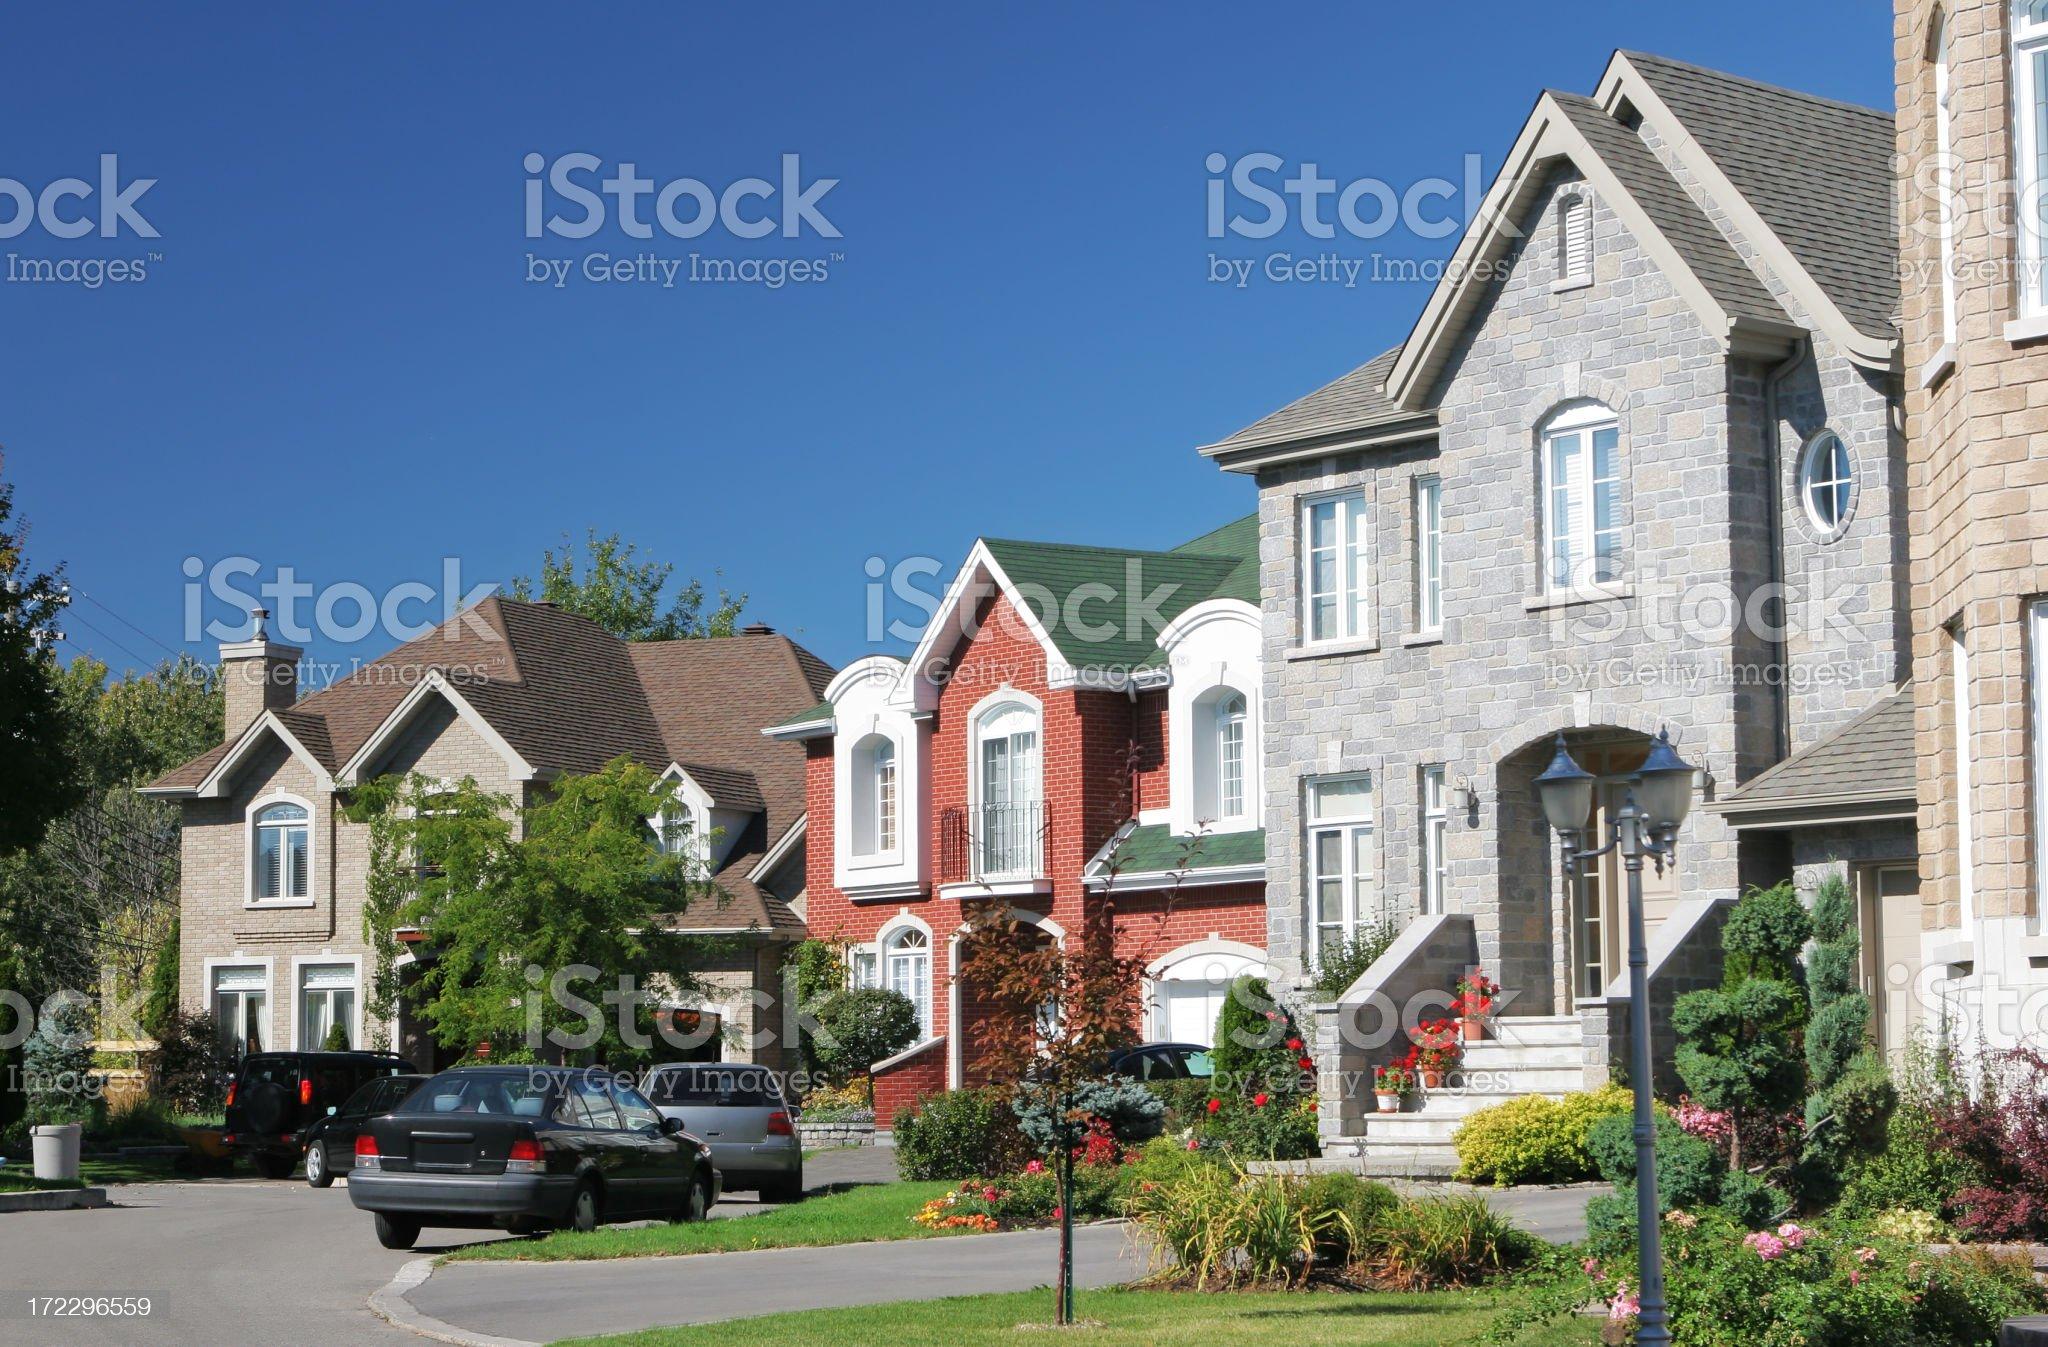 Classy Residential Neighborhood royalty-free stock photo